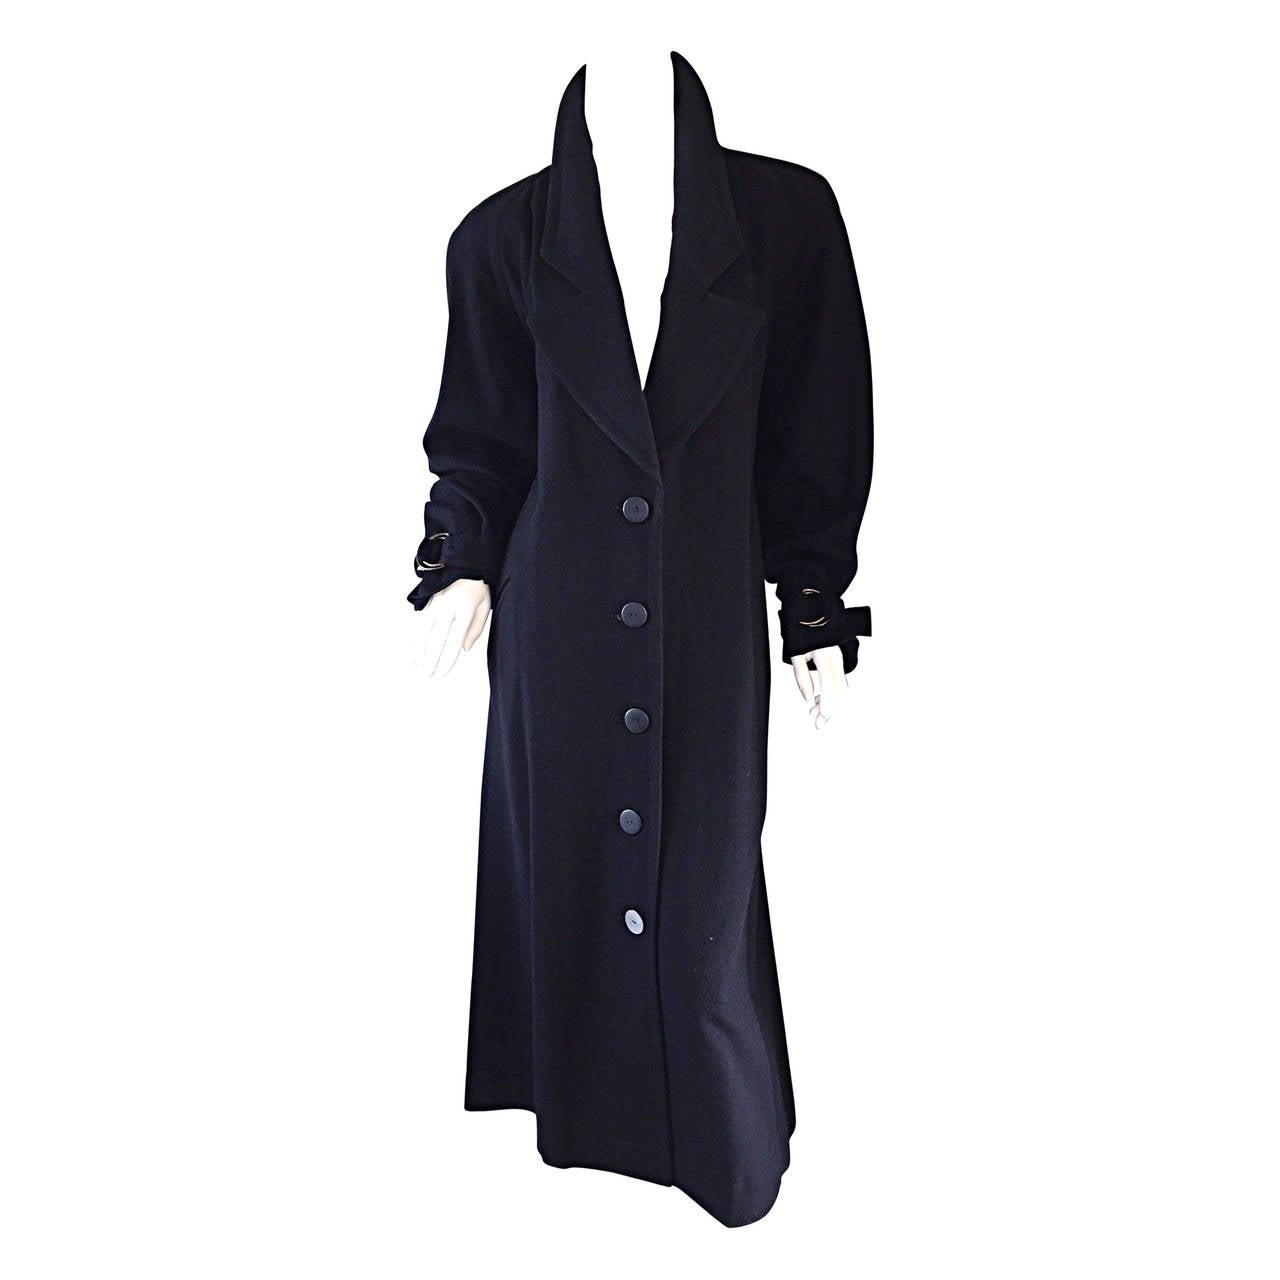 Vintage Chloe by Karl Lagerfeld Black Wool + Cashmere Avant Garde Spy Jacket